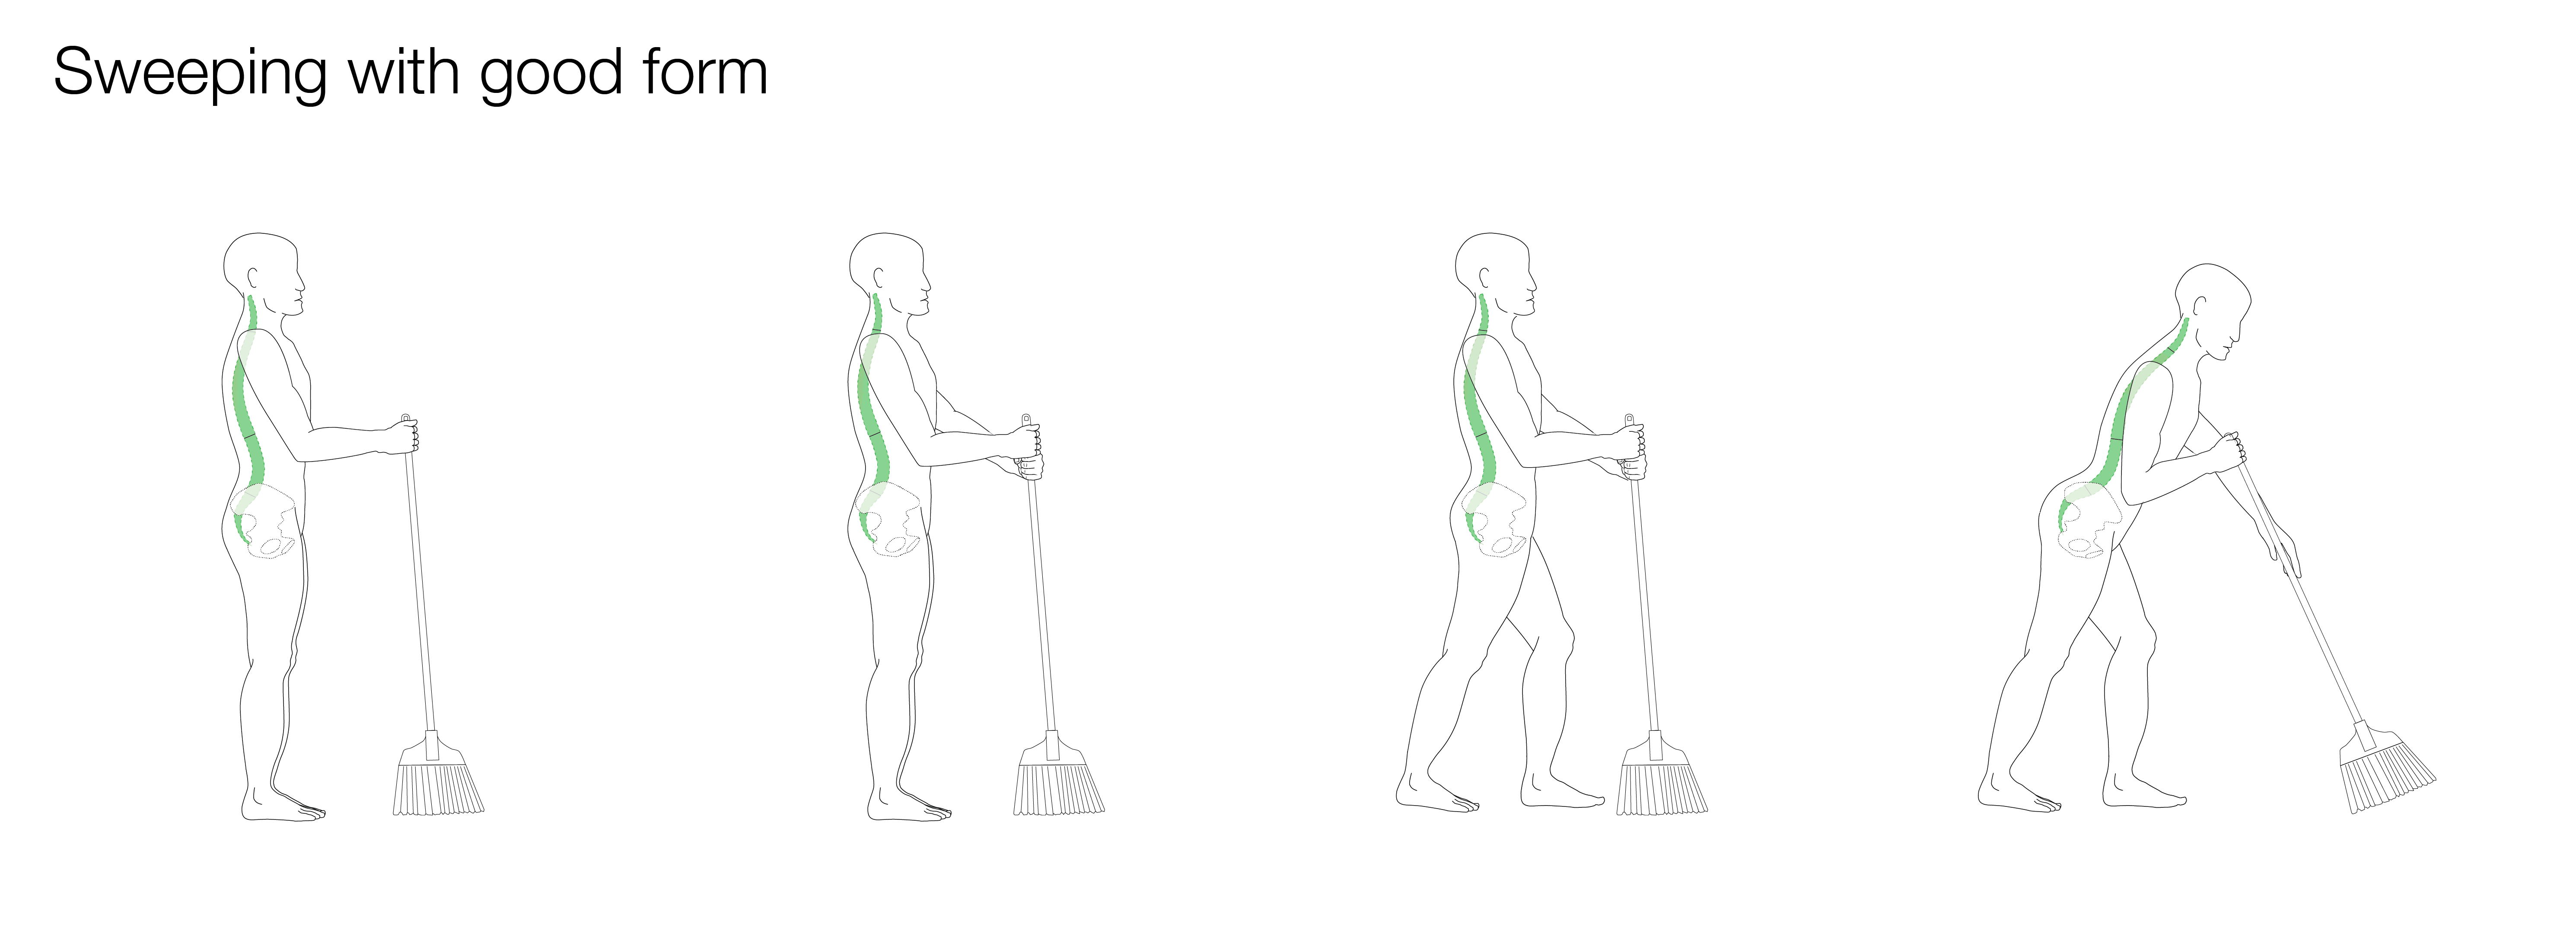 How to sweep_Artboard 10